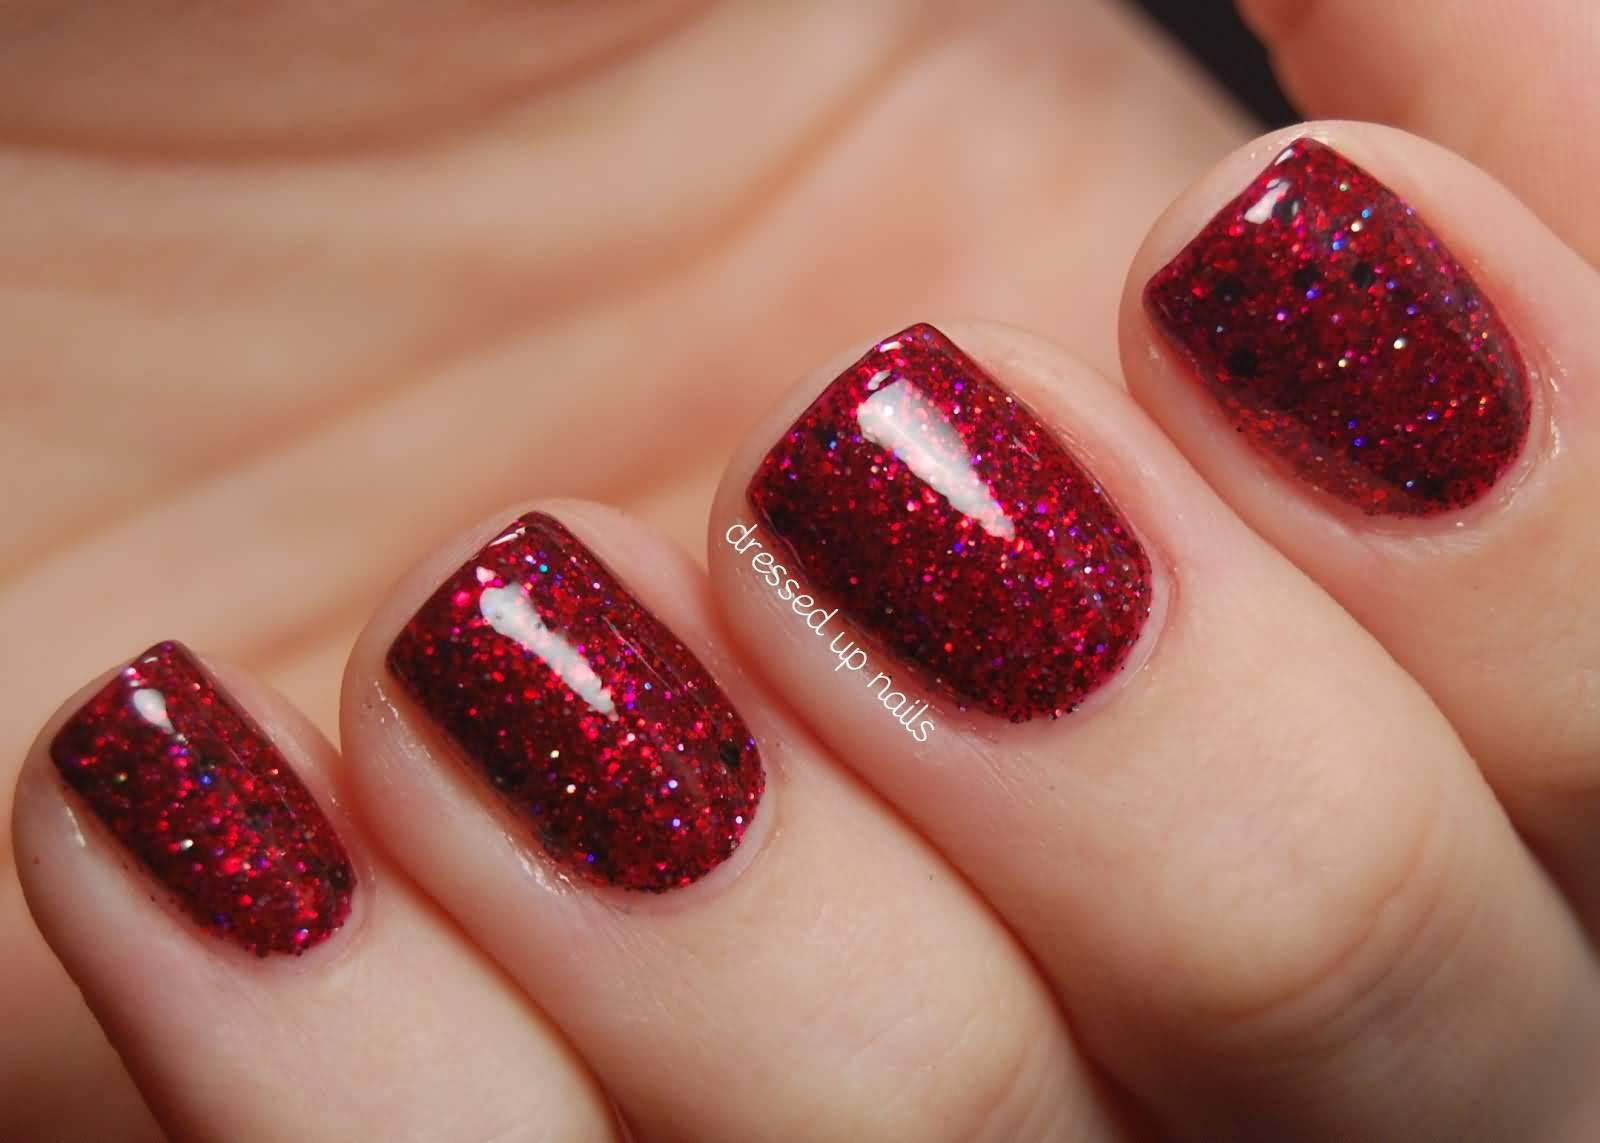 Red Glitter Gel Nail Art Design Idea